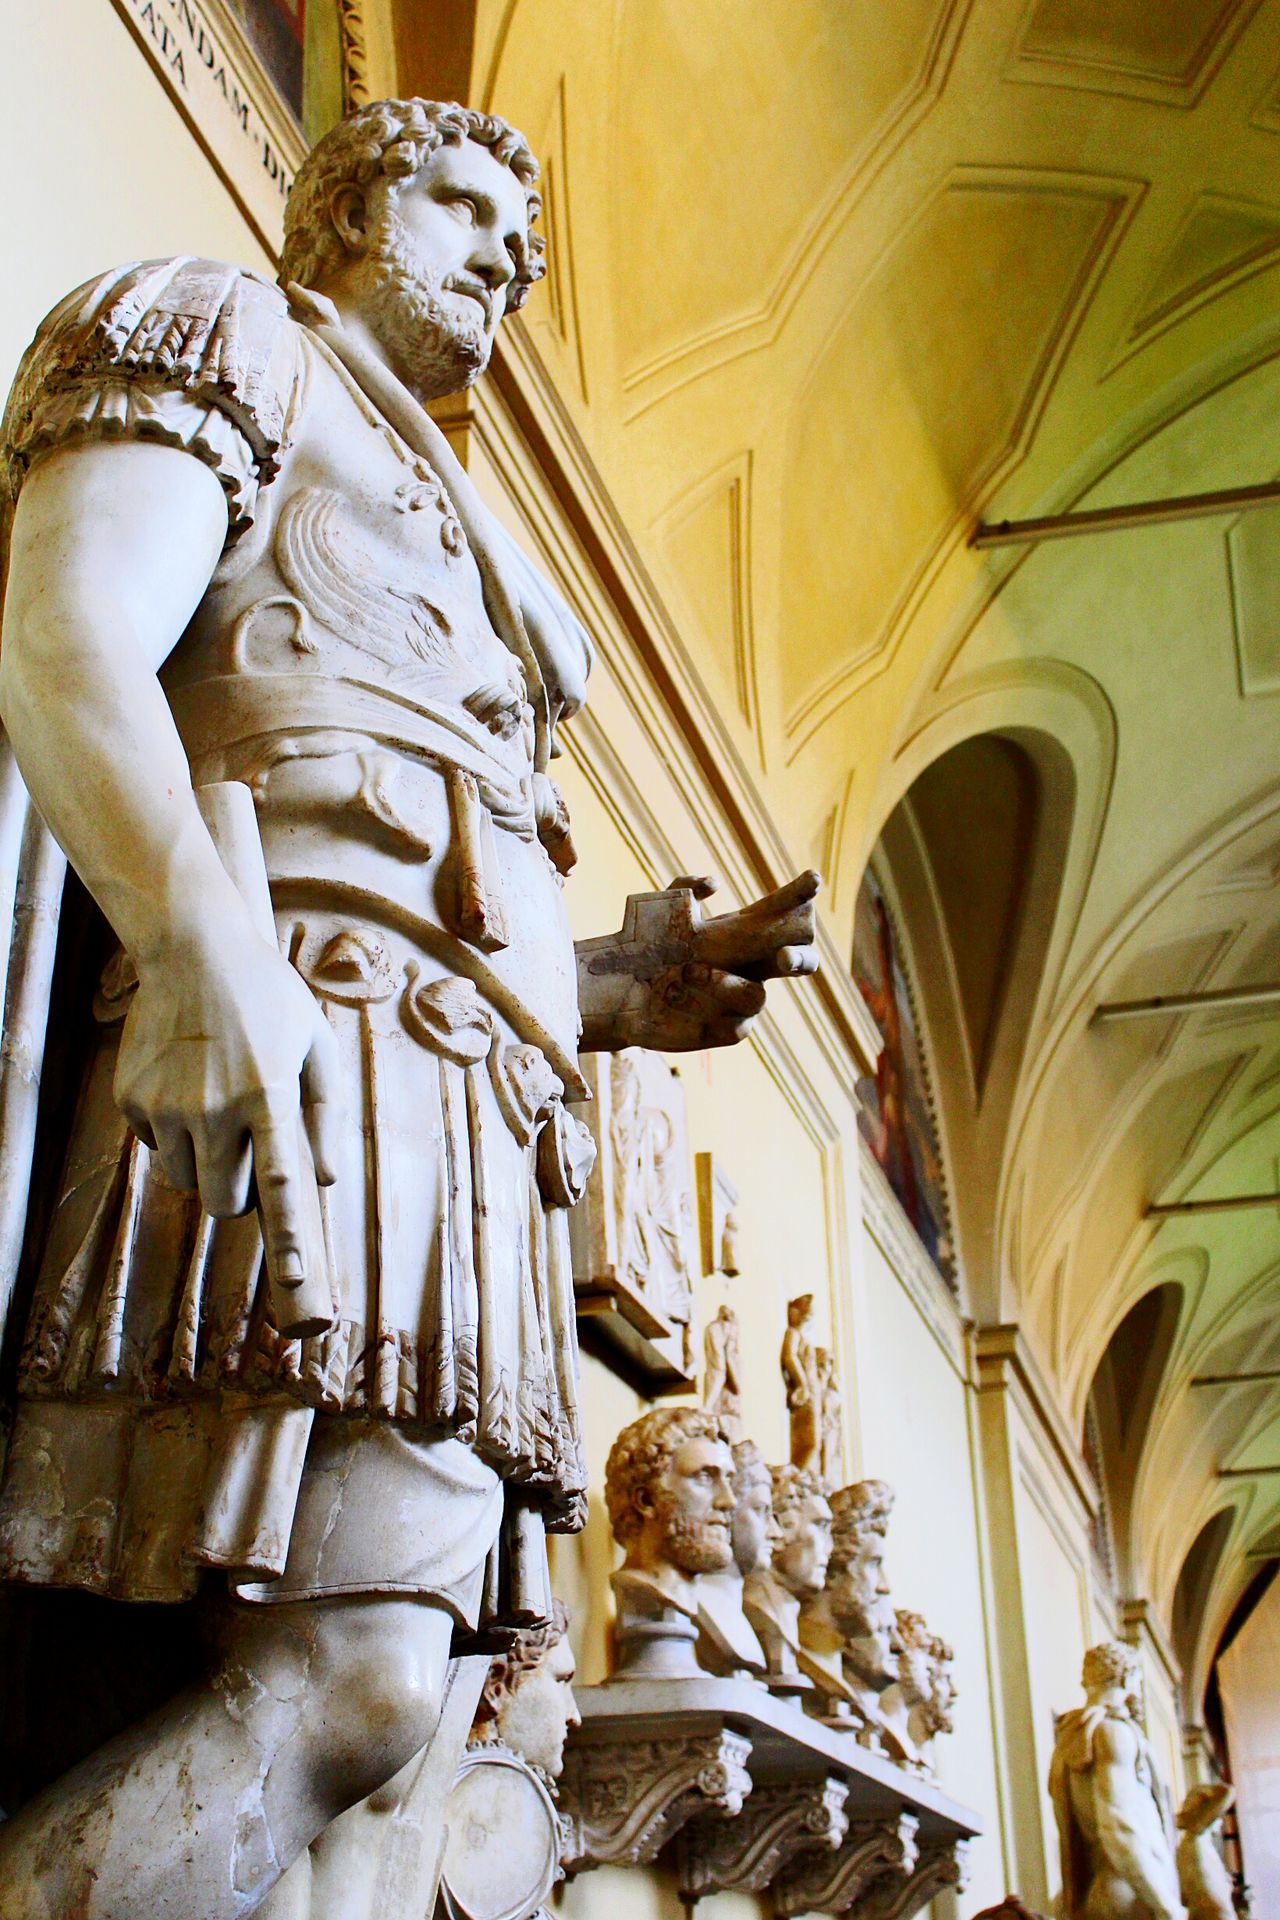 Human Representation Architectural Column Sculpture Indoors  Architecture Low Angle View Statue City VaticanCity Vaticano VaticanMuseum Emperador Adriano EmperadorAdriano